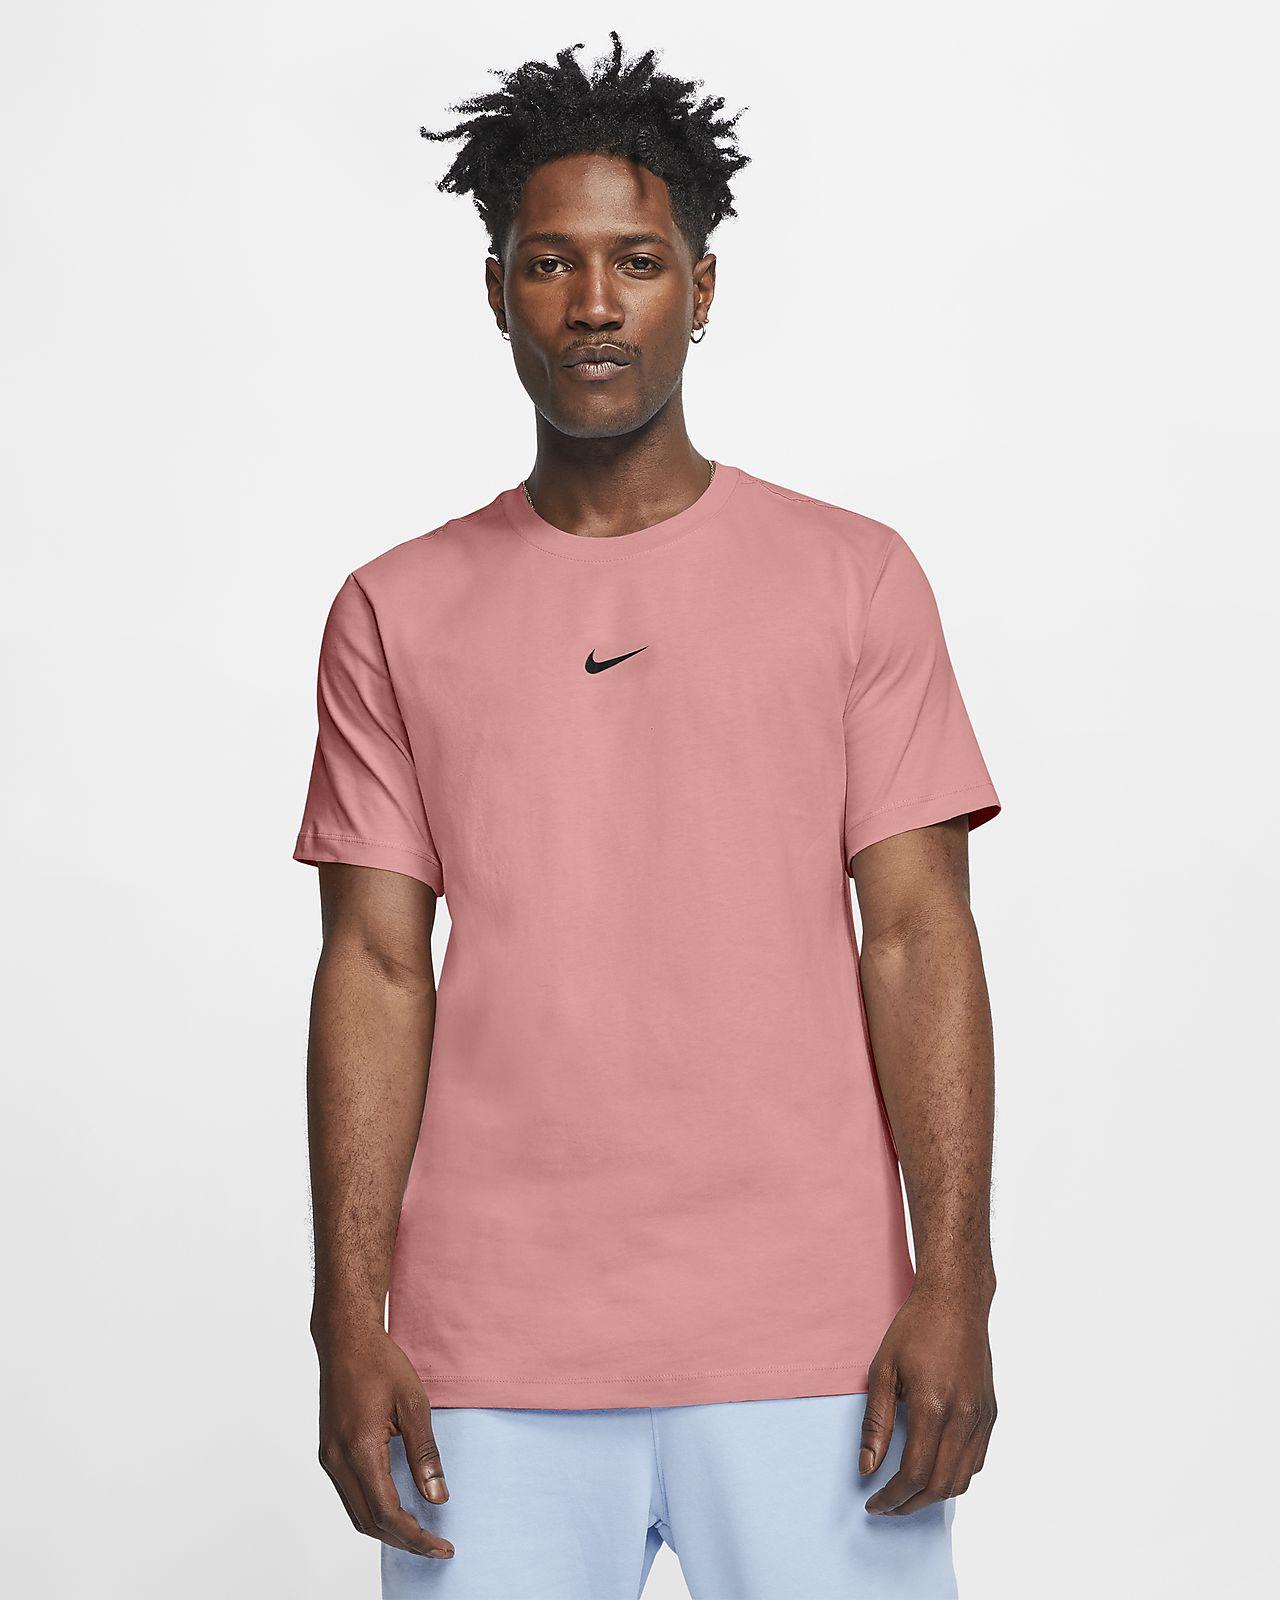 T-shirt con Swoosh Nike Sportswear - Uomo